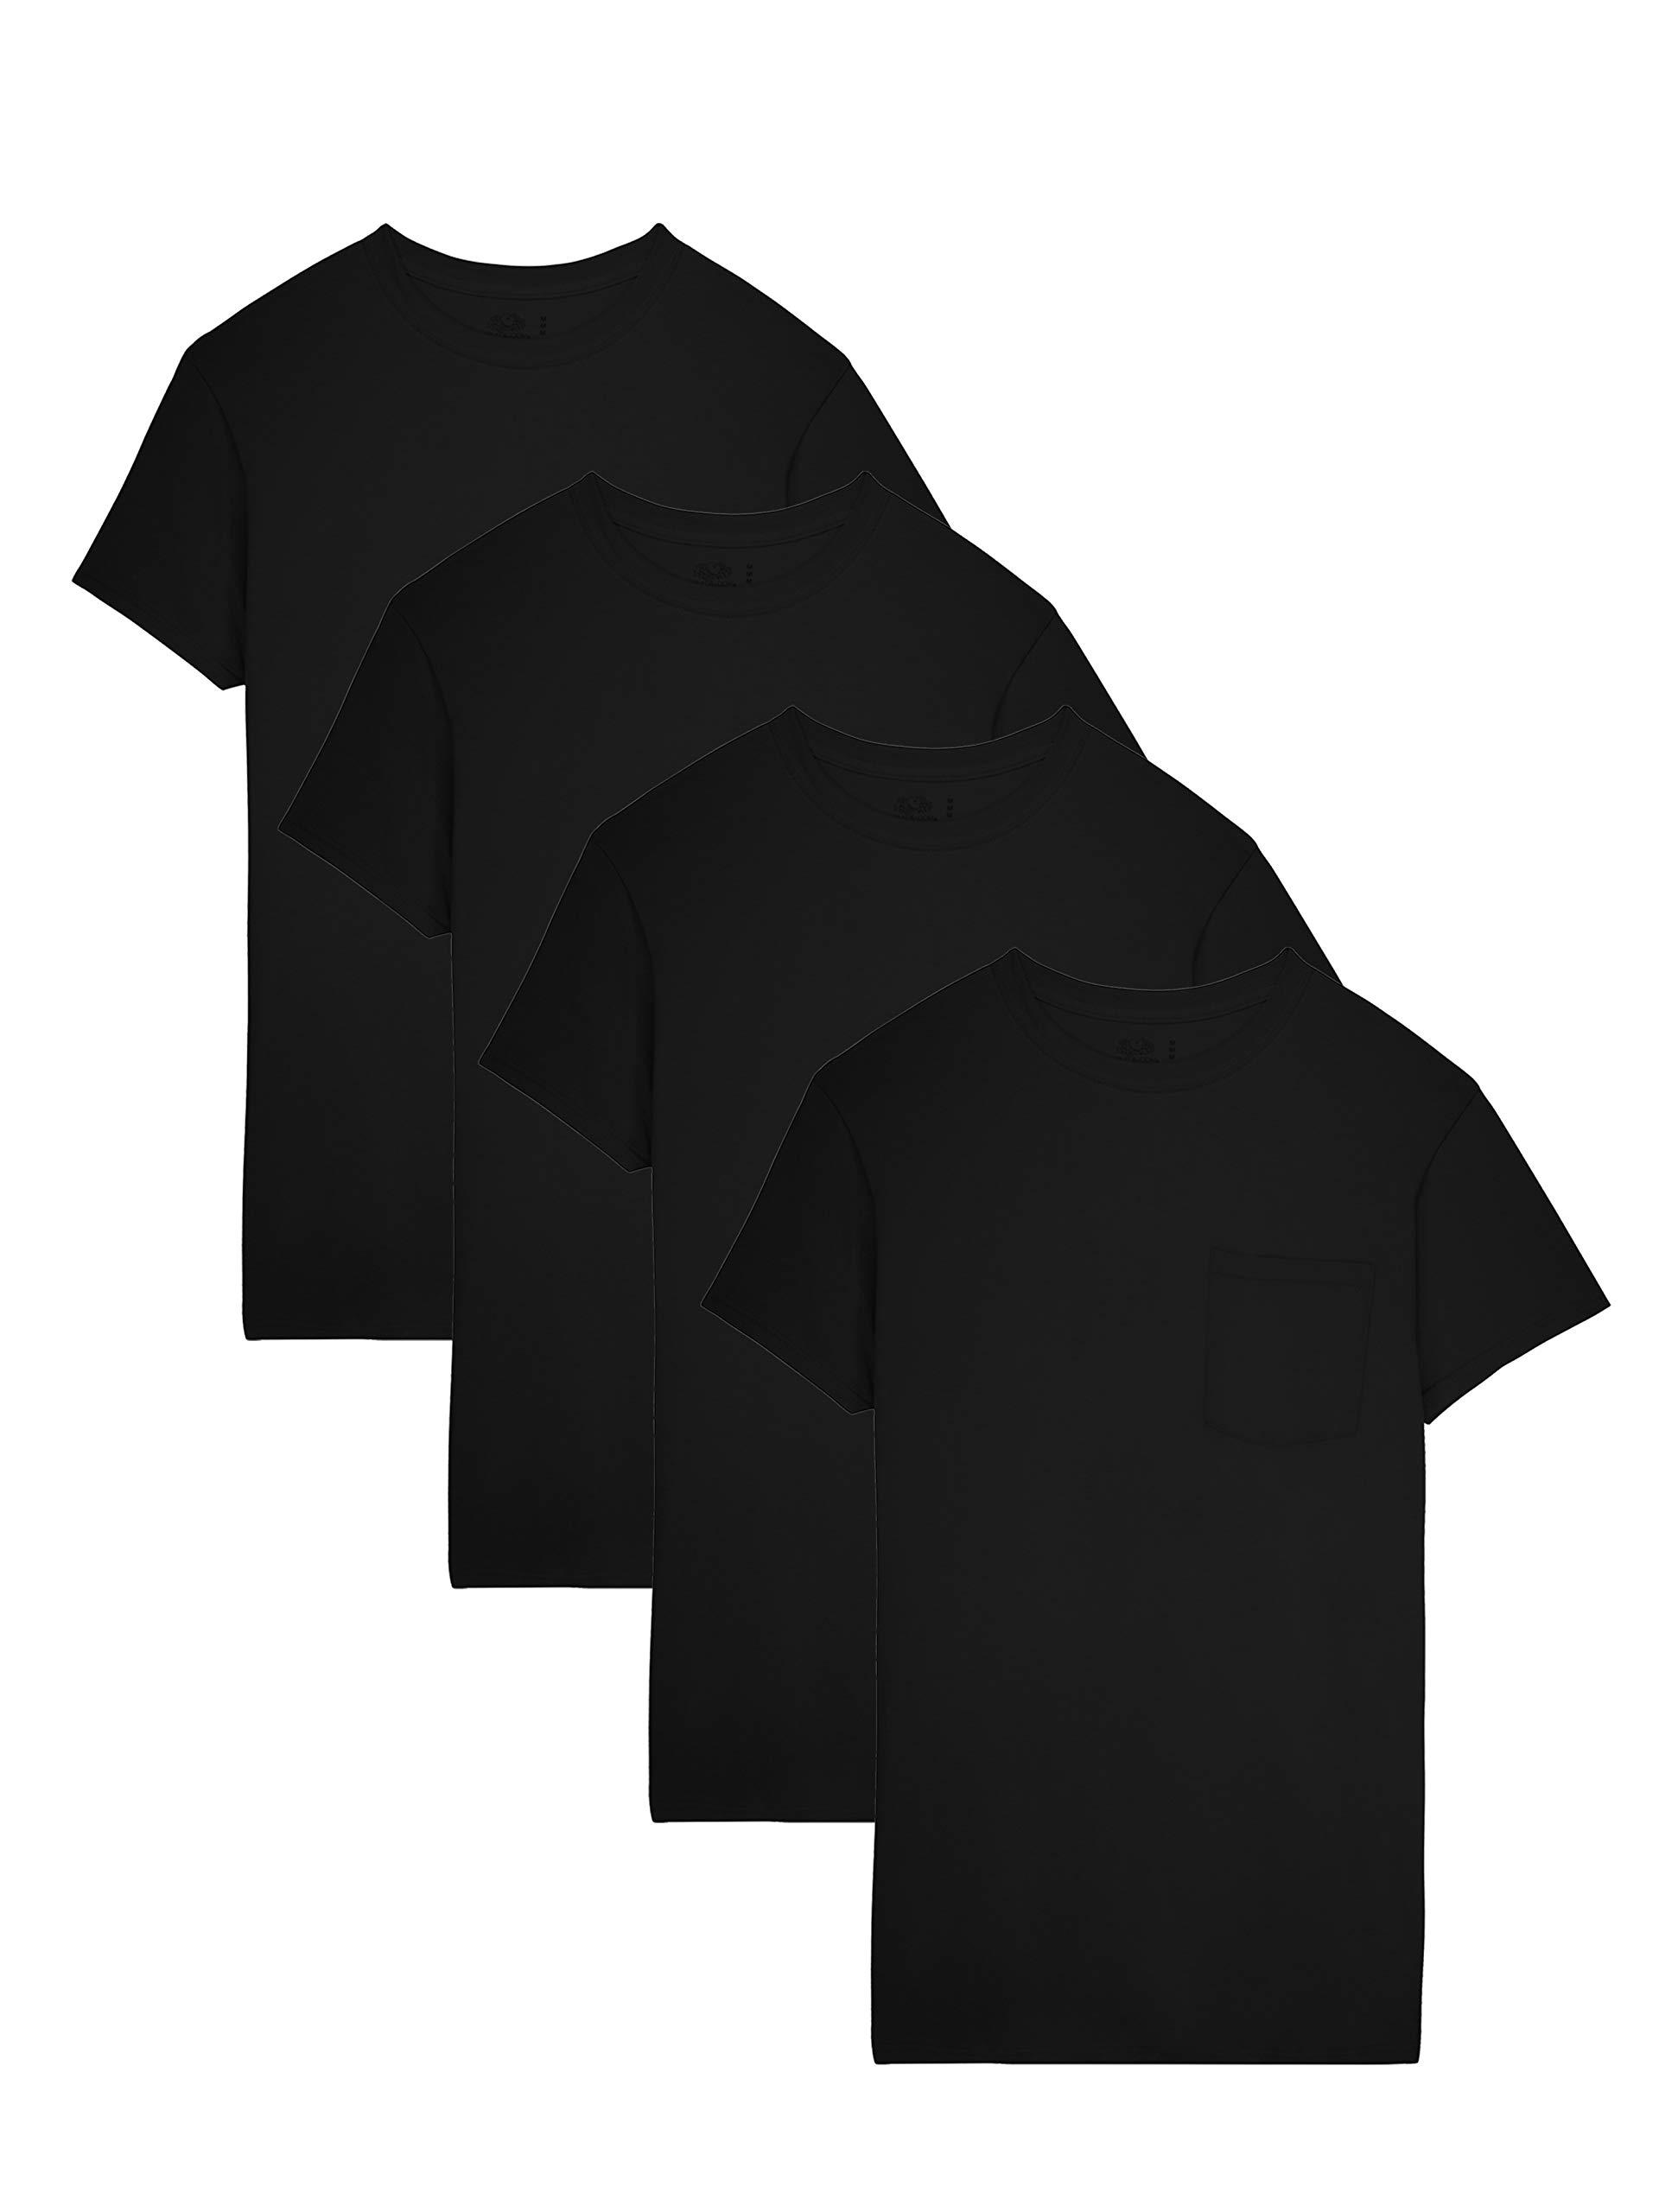 Fruit of the Loom Men's  Pocket Crew Neck T-Shirt (Pack of 4), Black, XX-Large